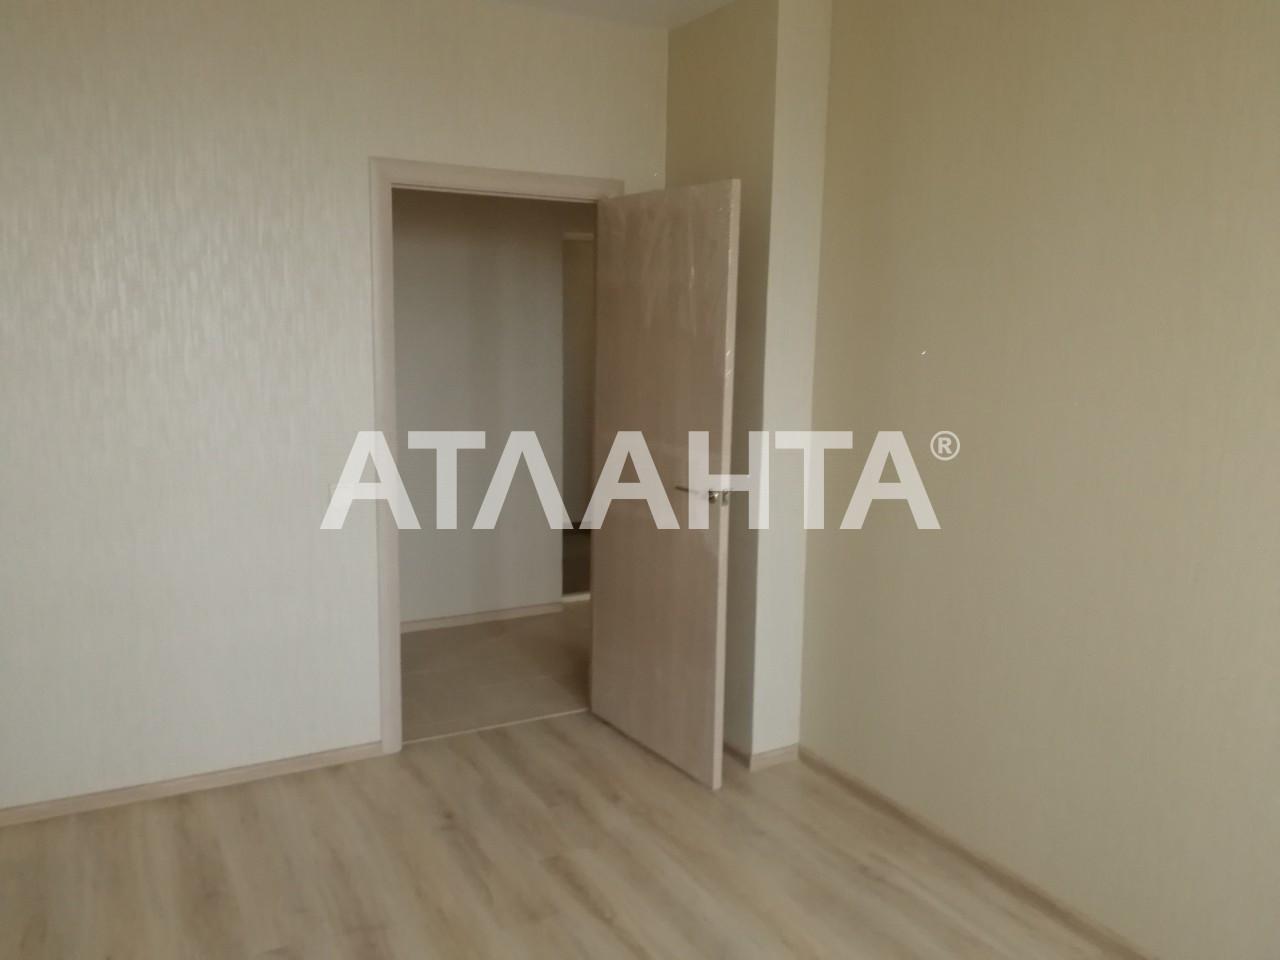 Продается 3-комнатная Квартира на ул. Воробьева Ак. — 58 300 у.е. (фото №7)